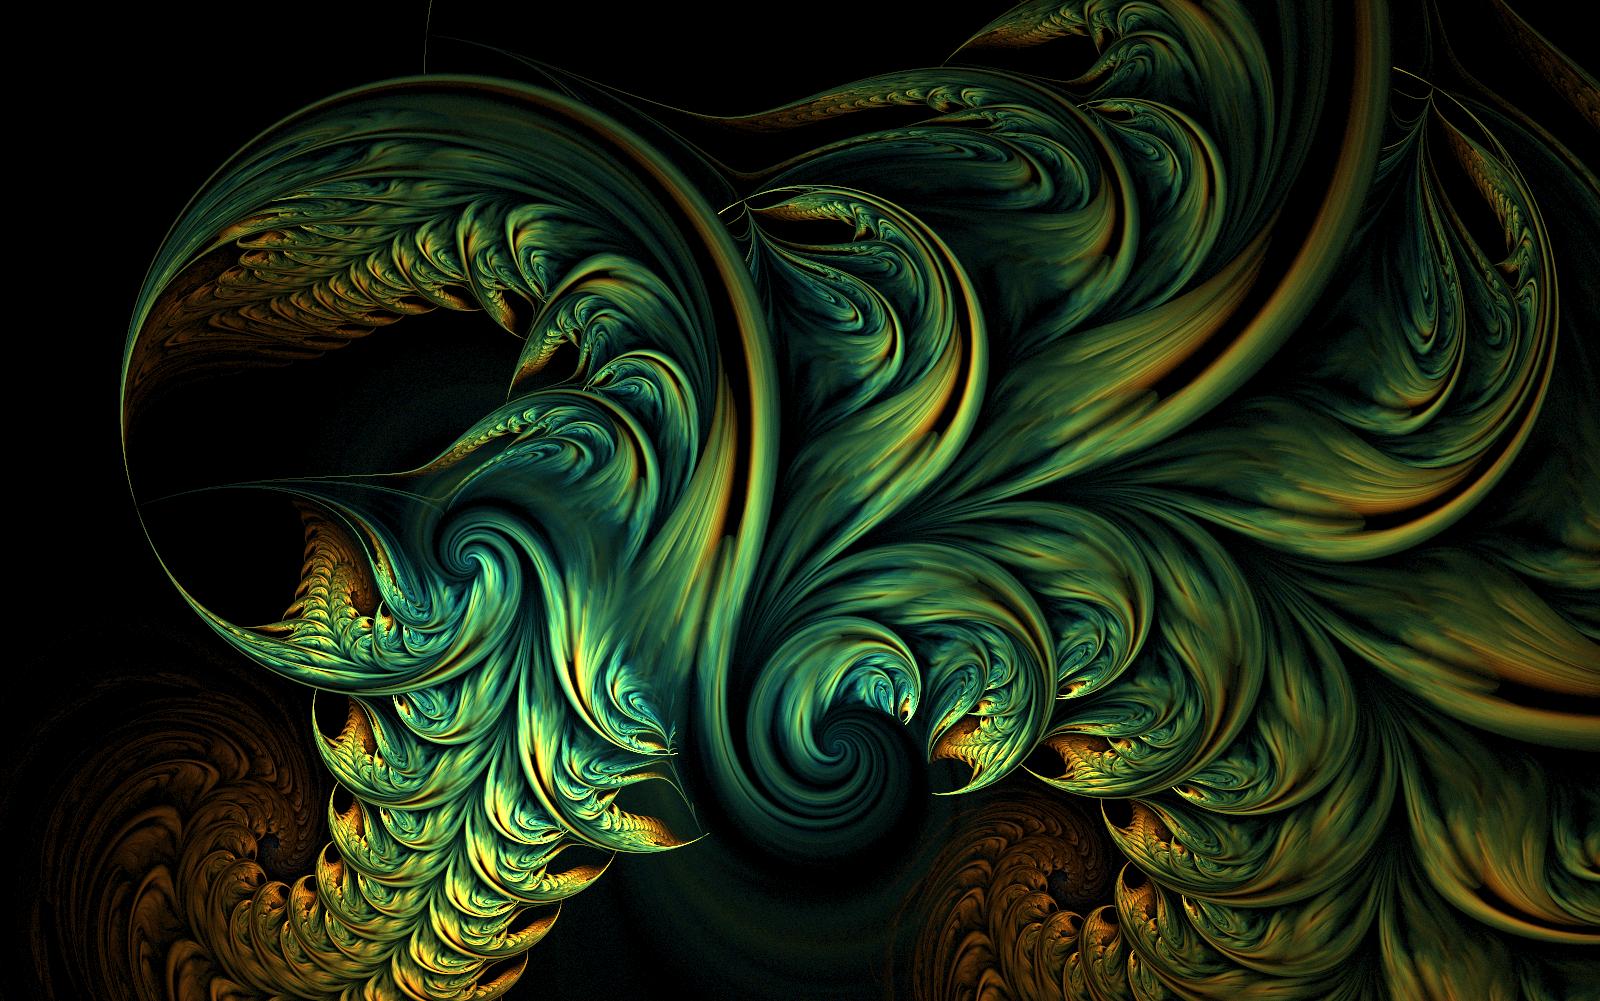 Green Dragon Fire by riverfox1